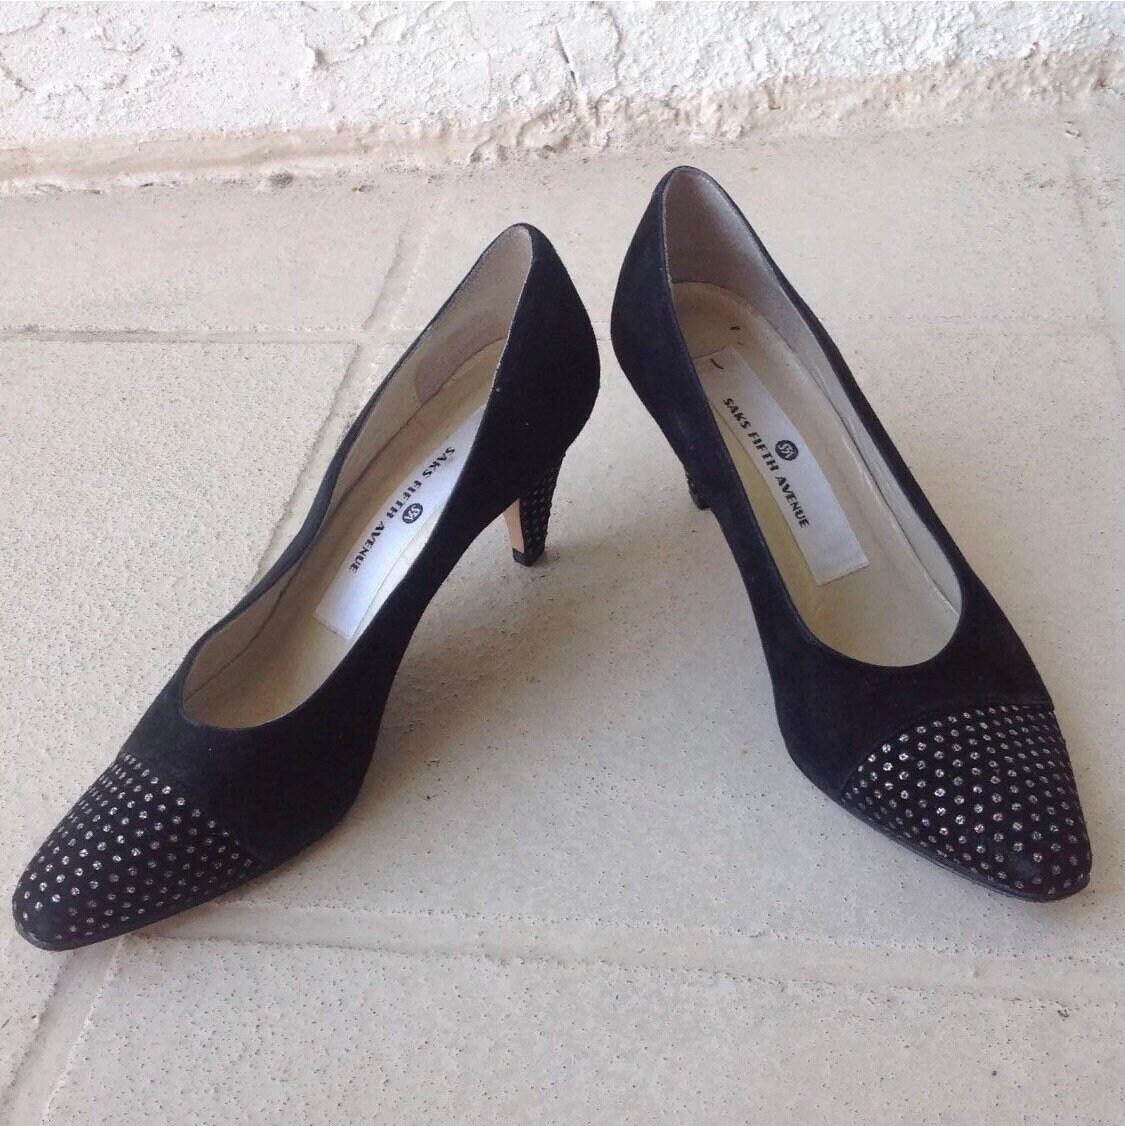 05164ff29d9 Vintage 80s Saks Fifth Avenue Black Suede Pumps Size 7.5 High Heels Glitter  Pointed Toe Shoes Vtg 1980s